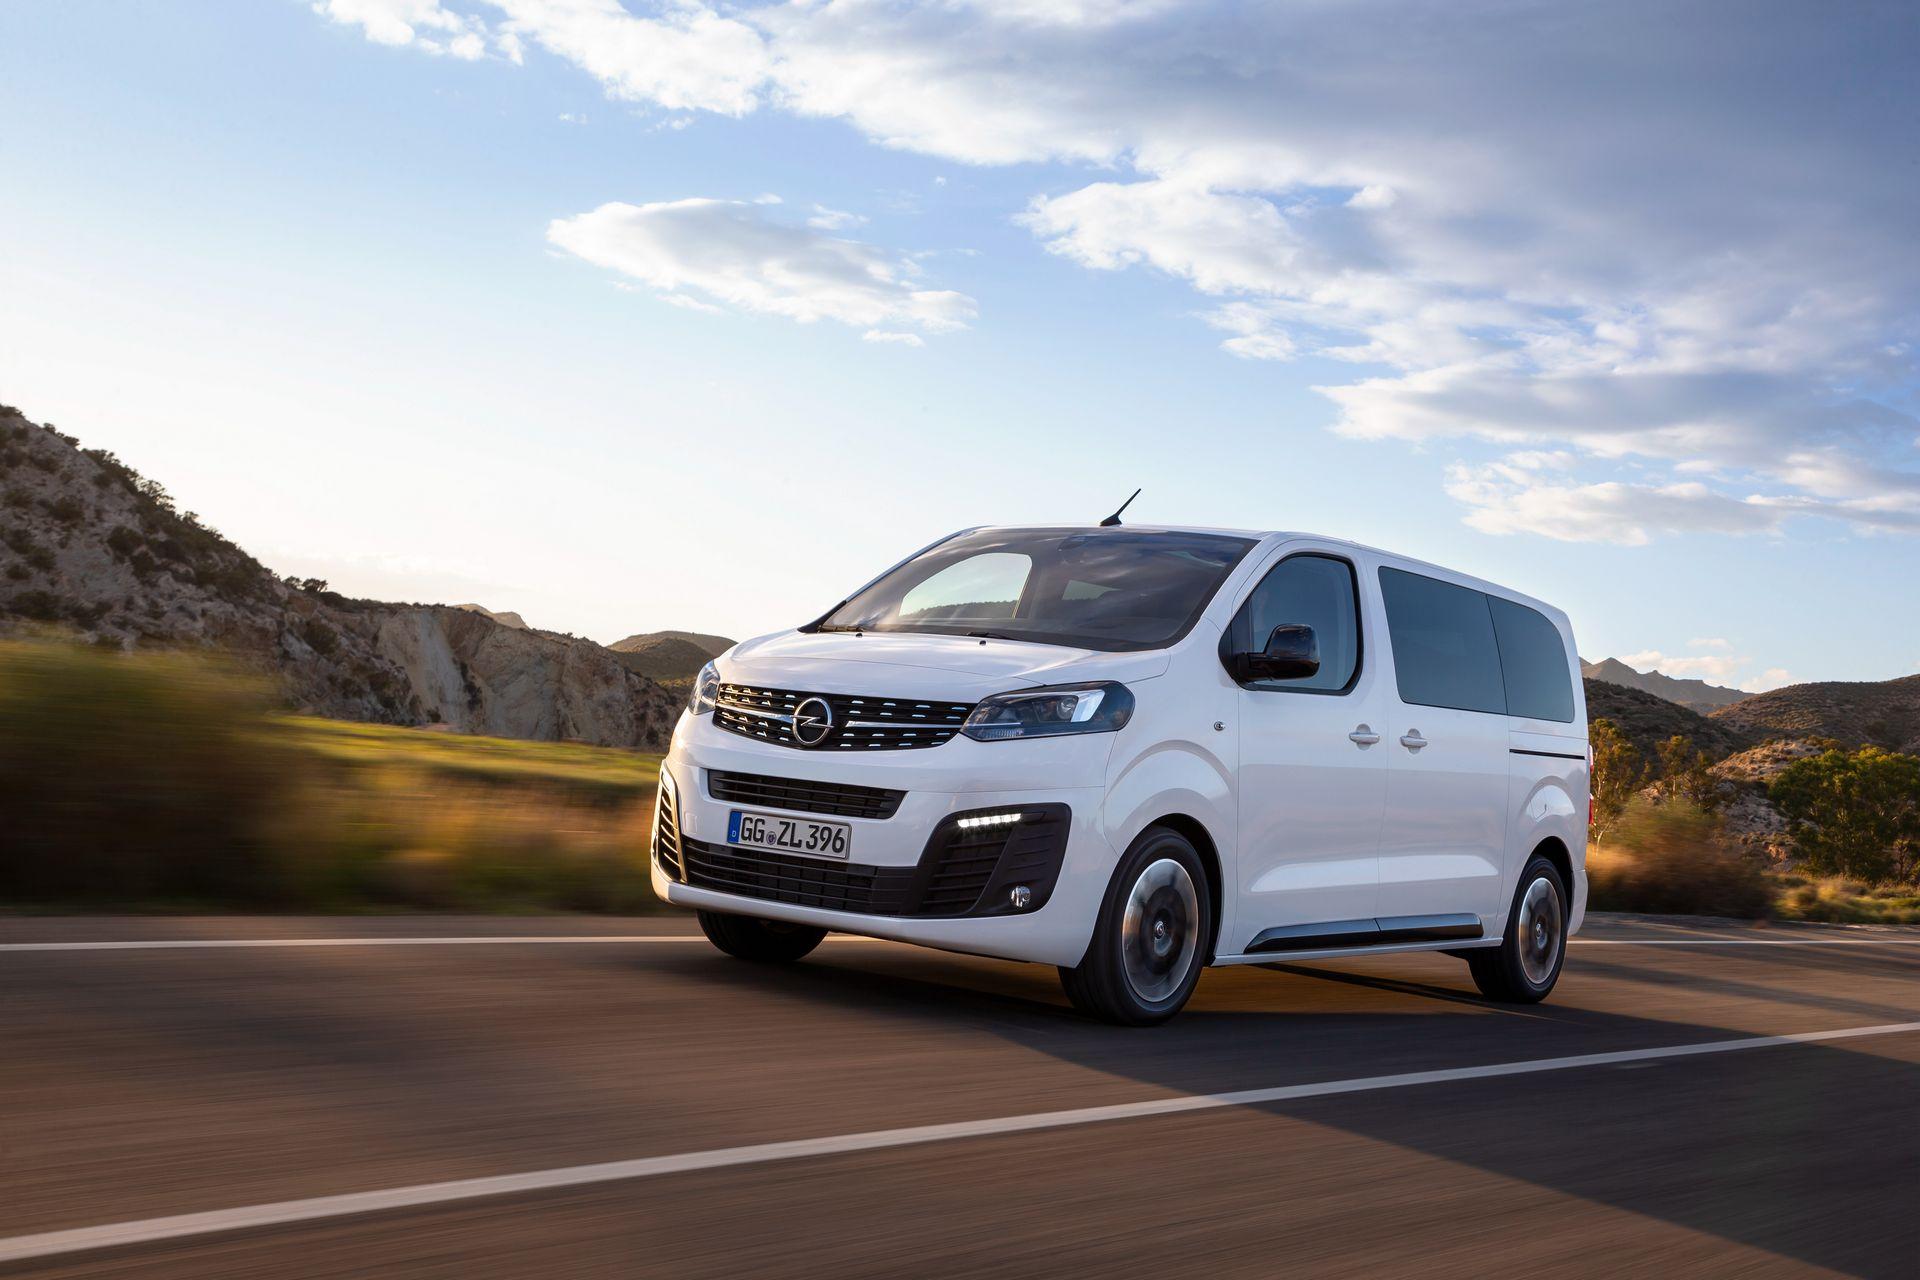 2019 Opel Zafira Life Vauxhall Vivaro Life Revealed Ev Incoming